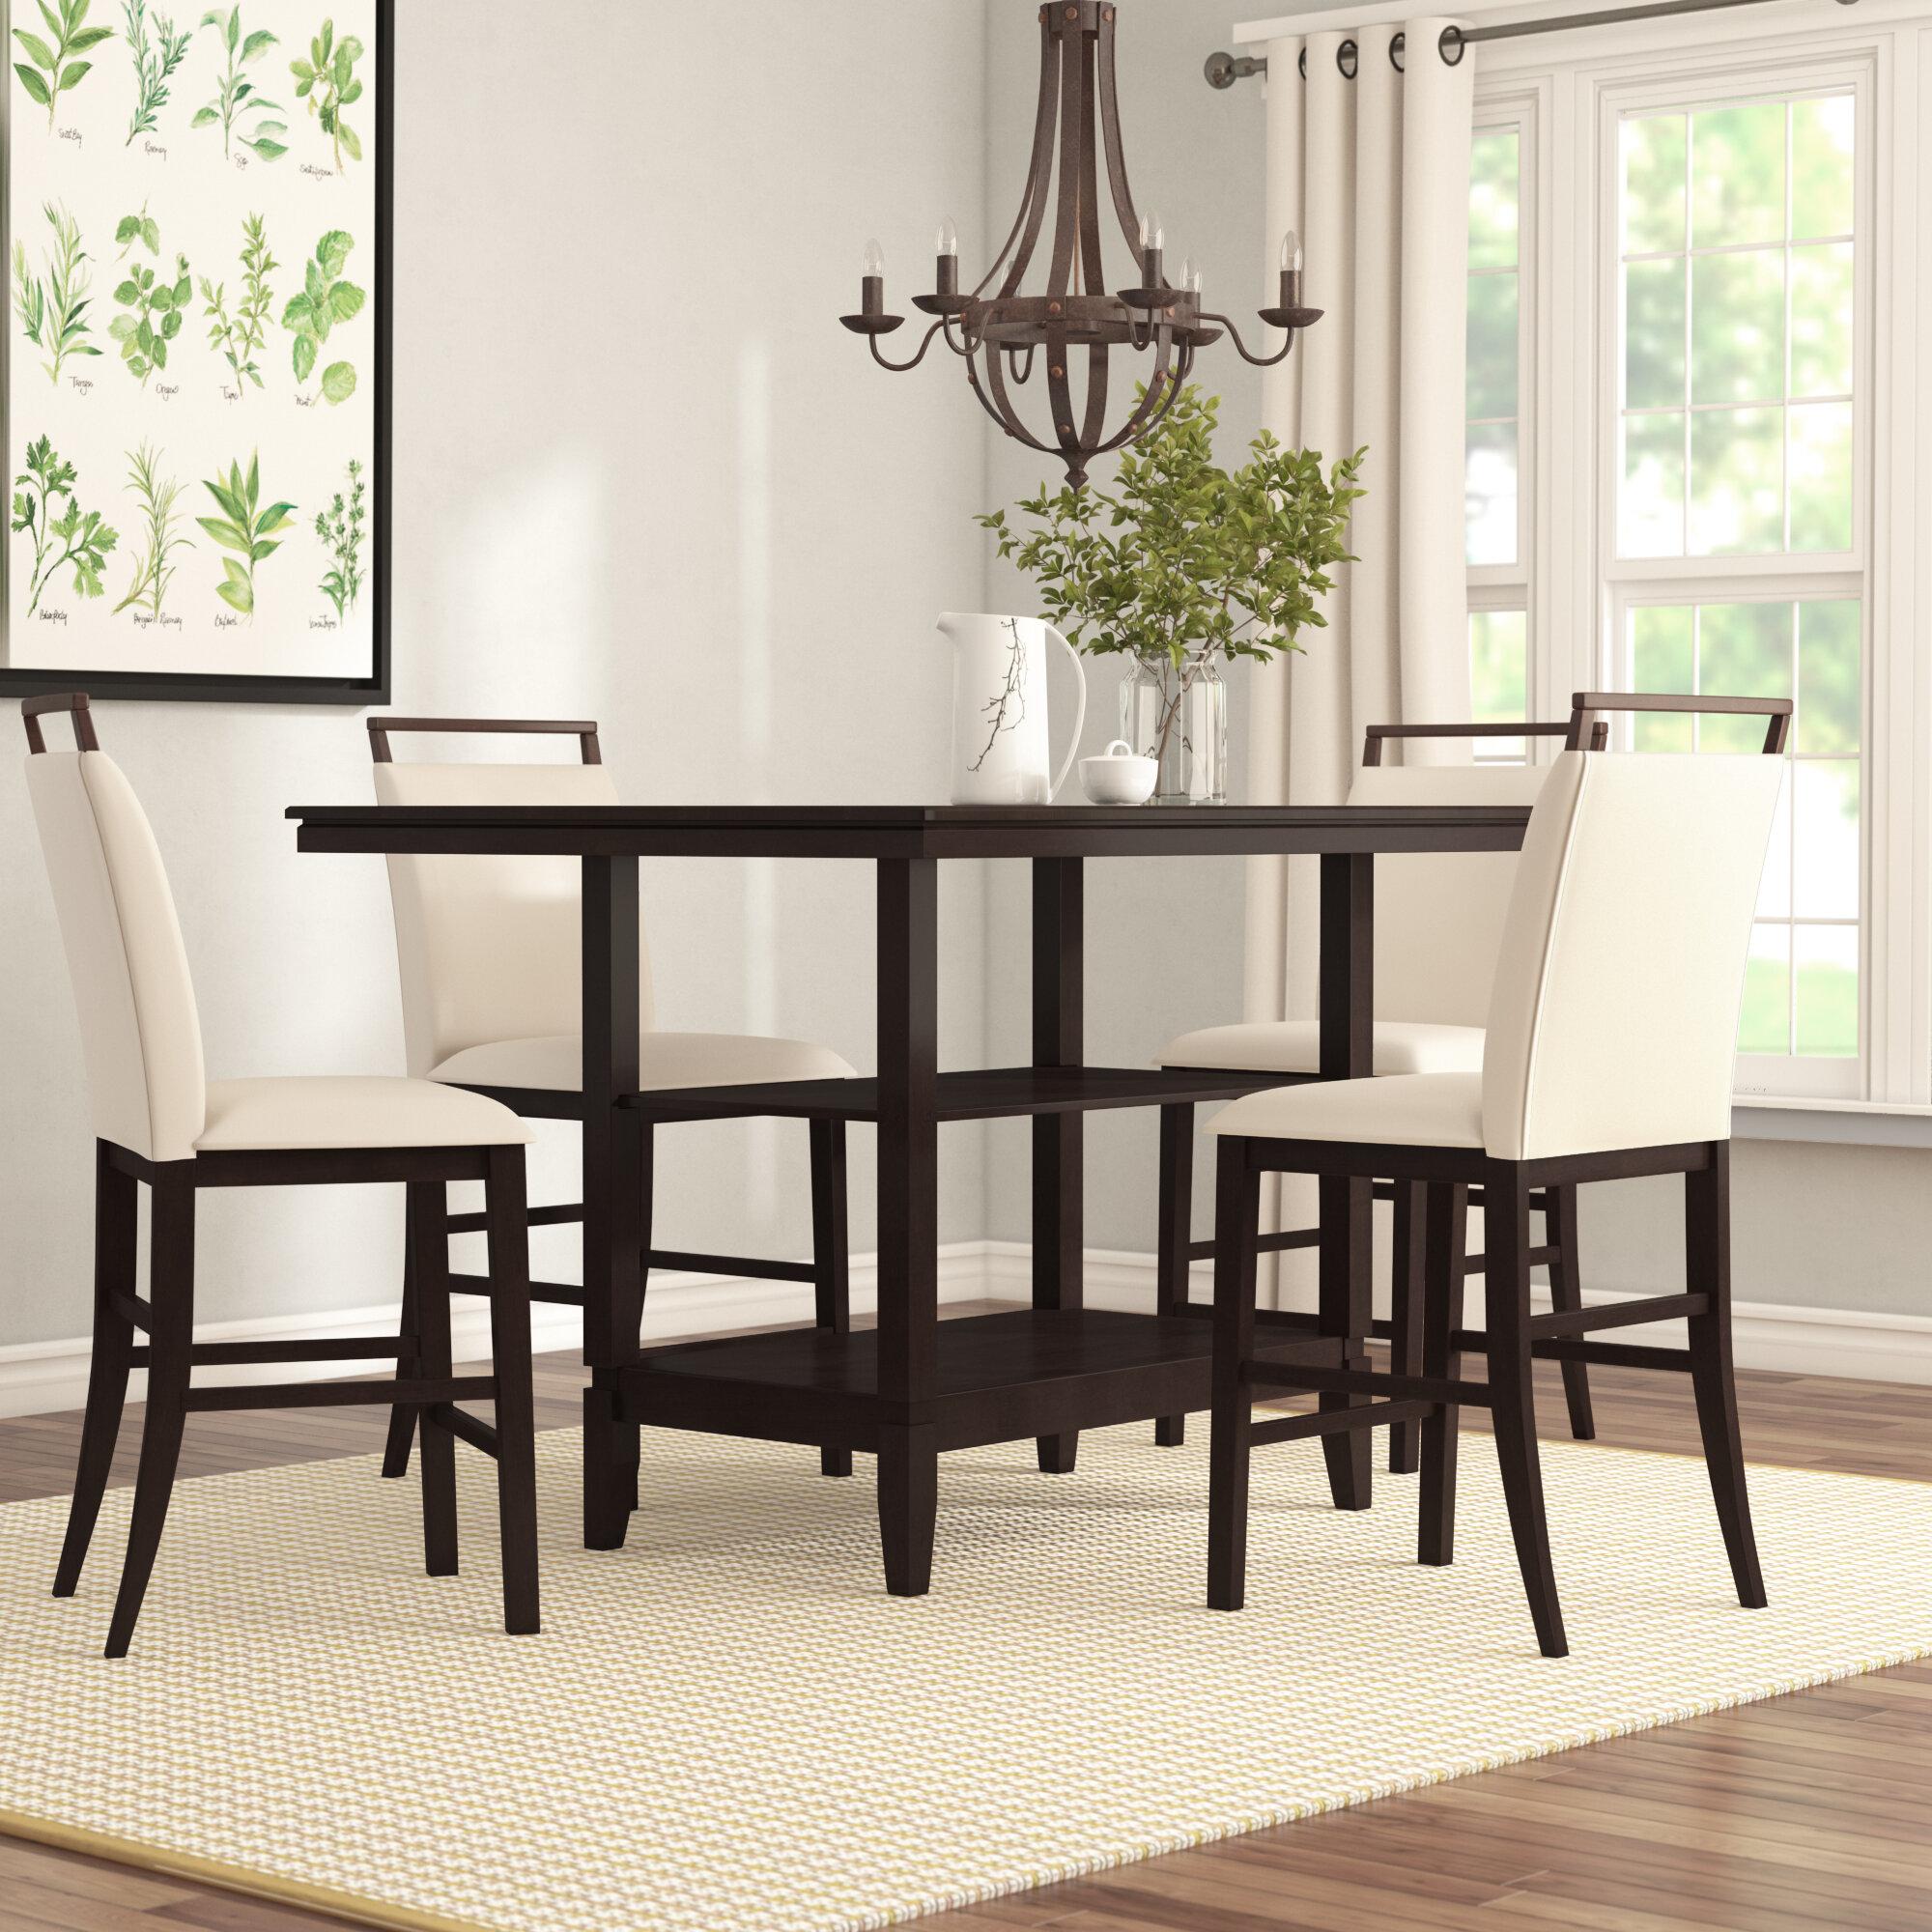 White Cane Outdoor Furniture, Gracie Oaks Tarra 5 Piece Counter Height Dining Set Reviews Wayfair